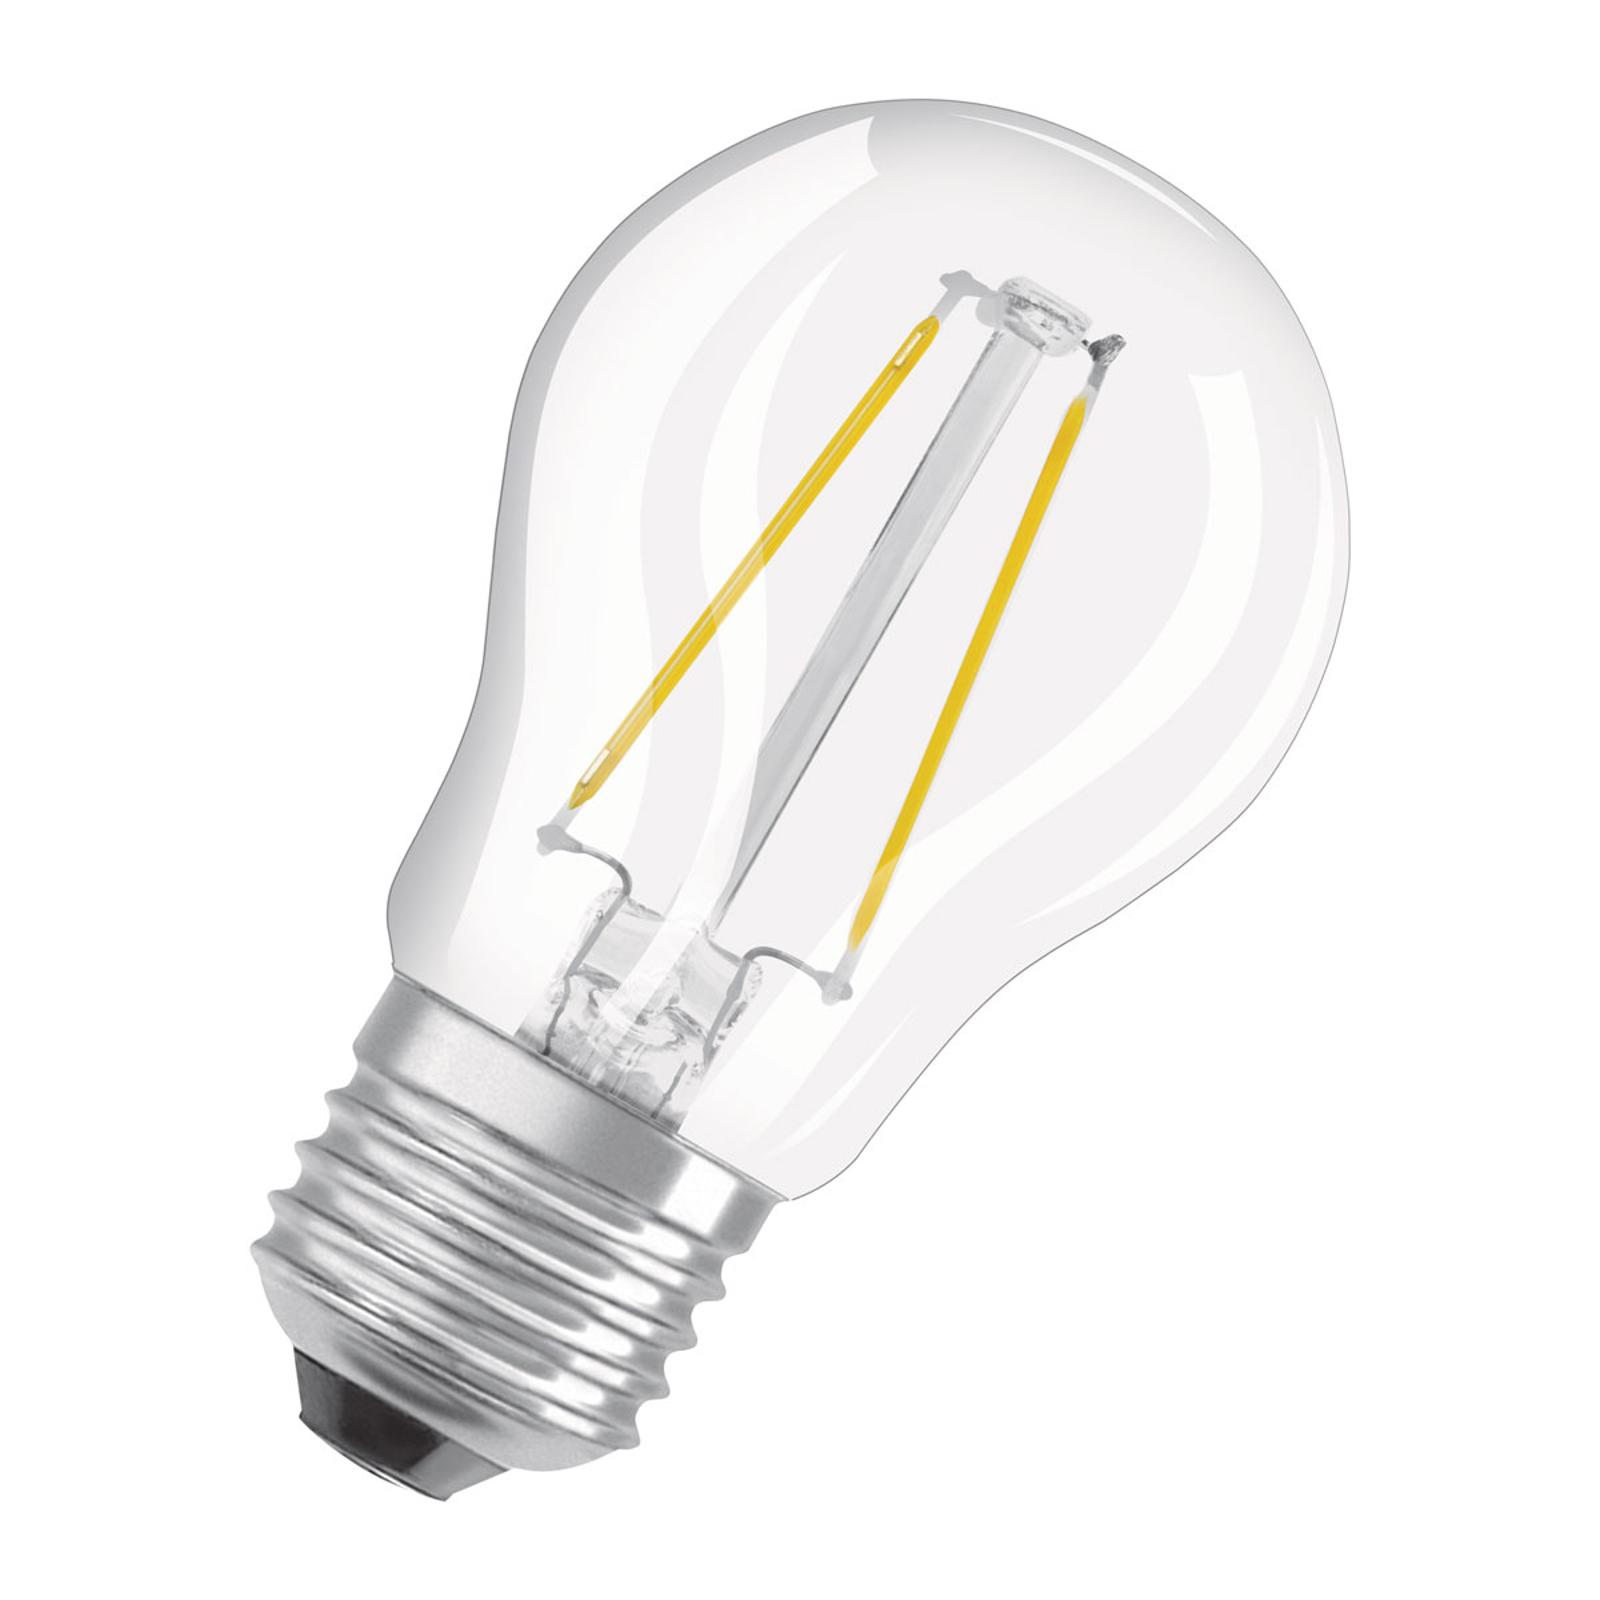 OSRAM LED-Lampe E27 2,8W dimmbar warmweiß klar